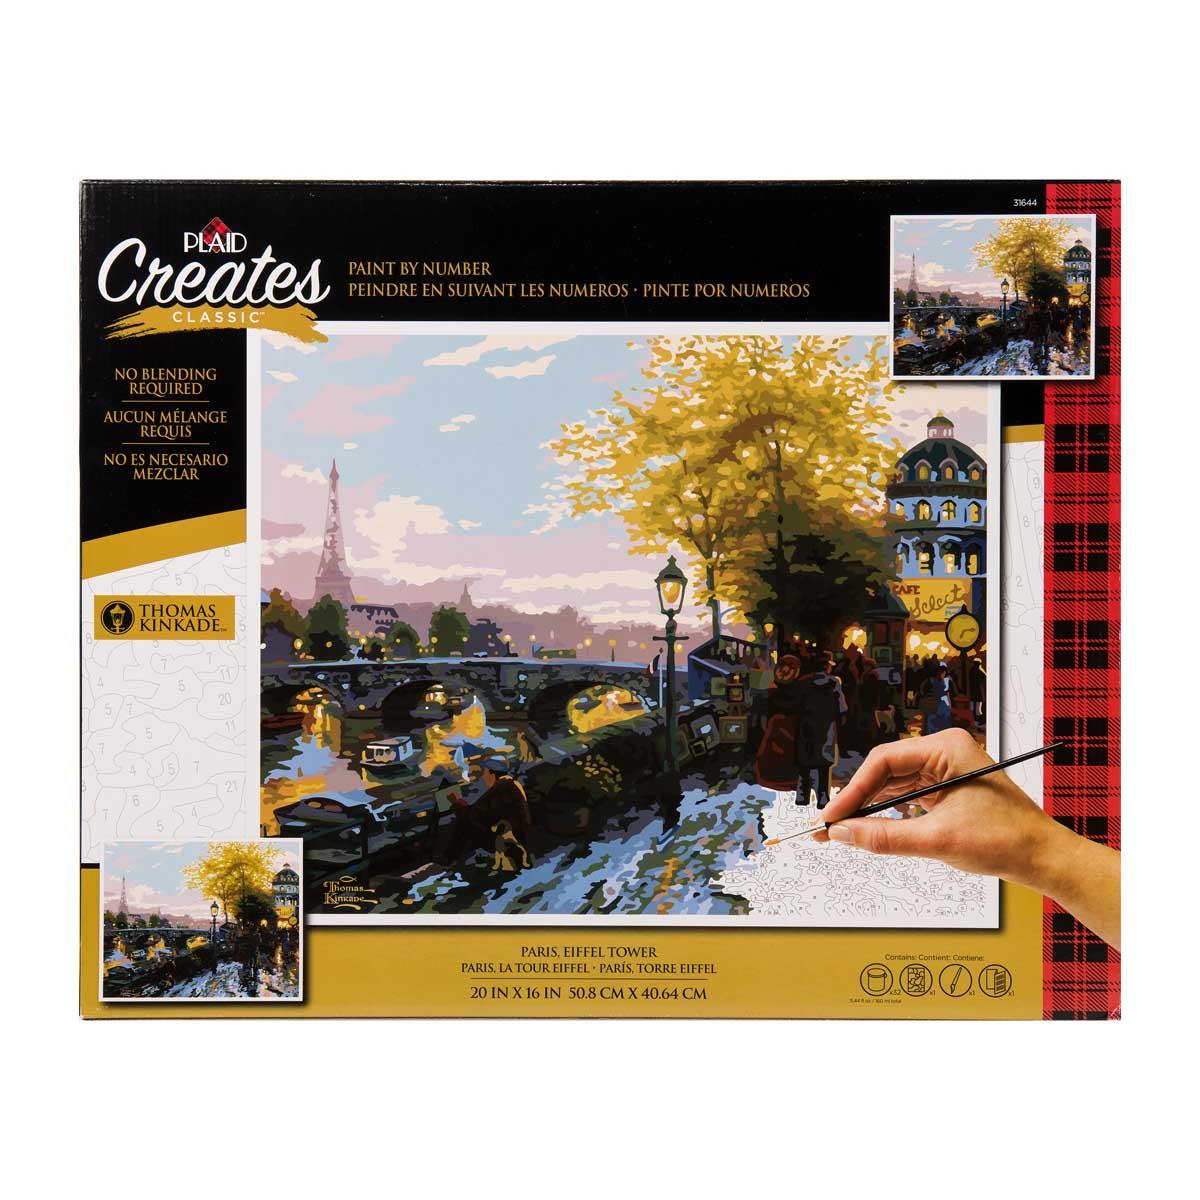 Plaid ® Paint by Number - Thomas Kinkade™ - Paris, Eiffel Tower